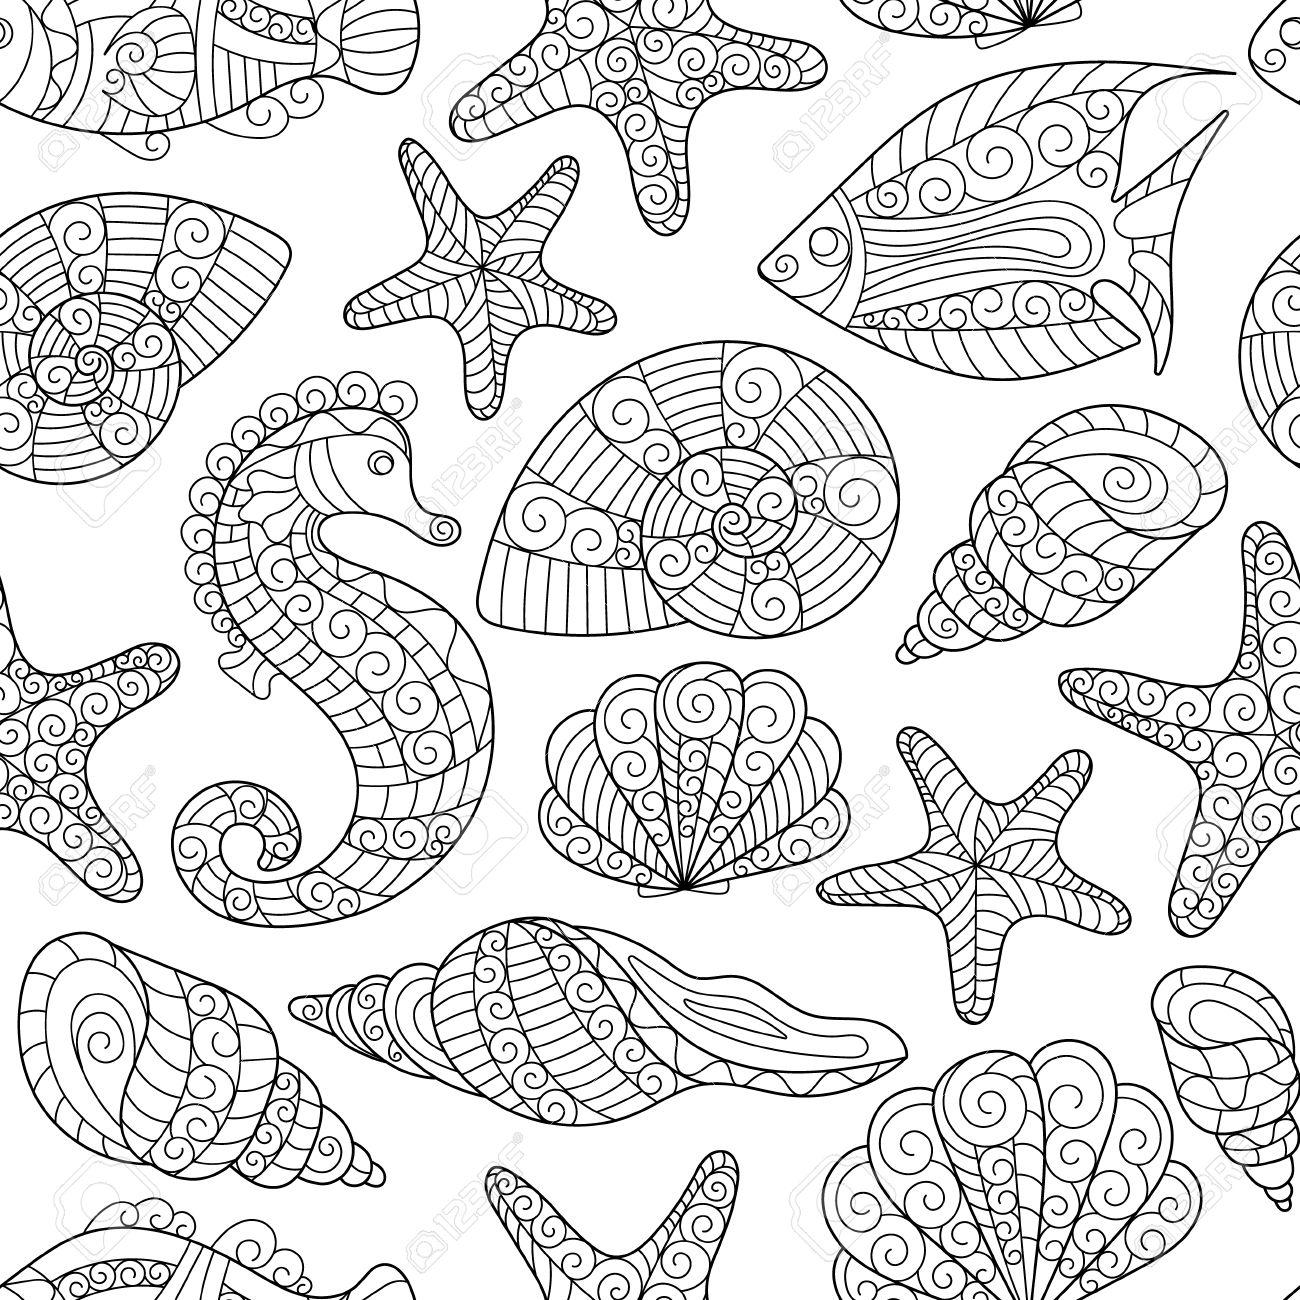 modelo inconsútil blanco y negro para colorear conchas de mar